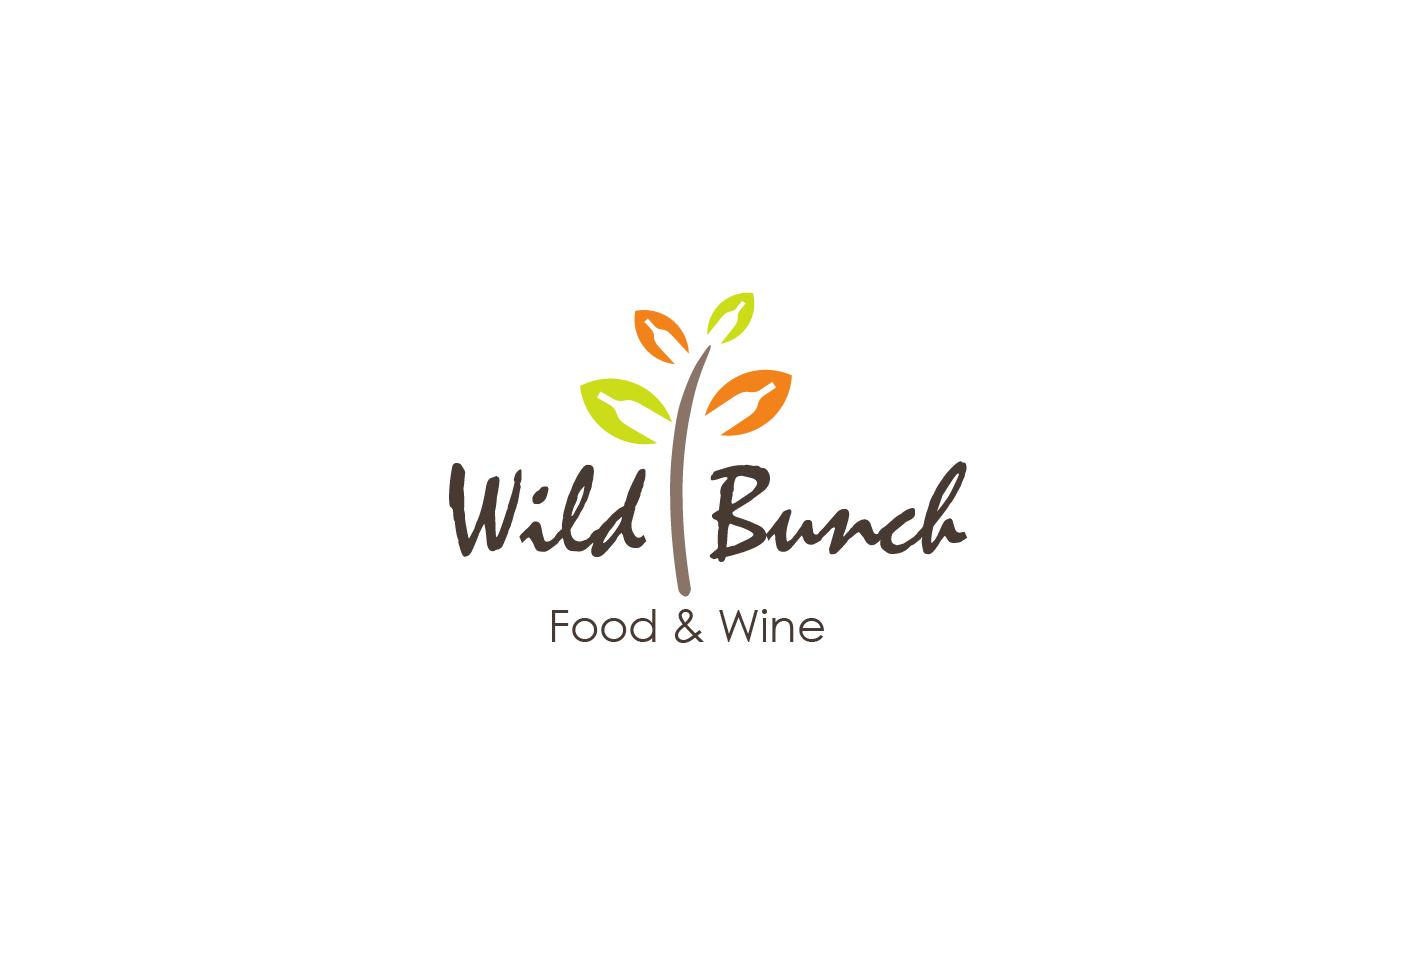 Wild Bunch Food + Wine needs a new logo